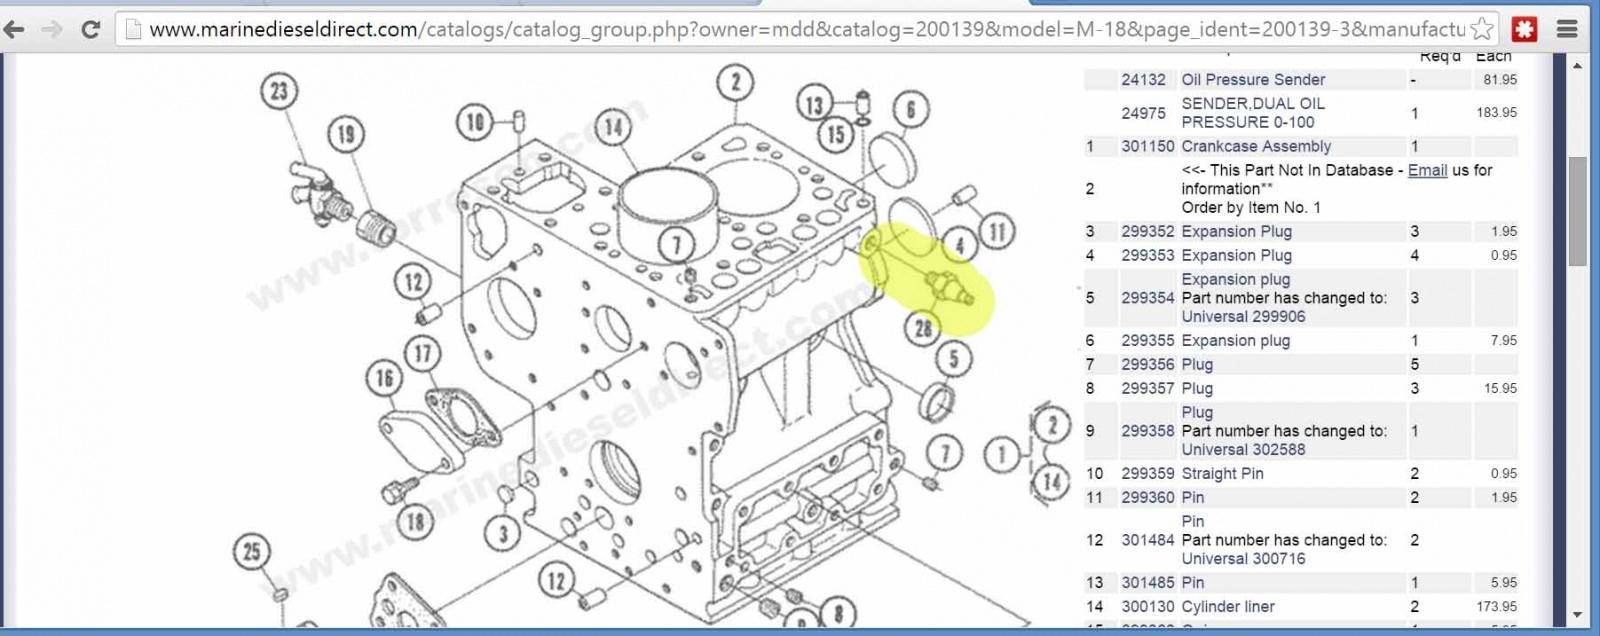 Click image for larger version  Name:oil pressure sender.jpg Views:54 Size:269.6 KB ID:104112